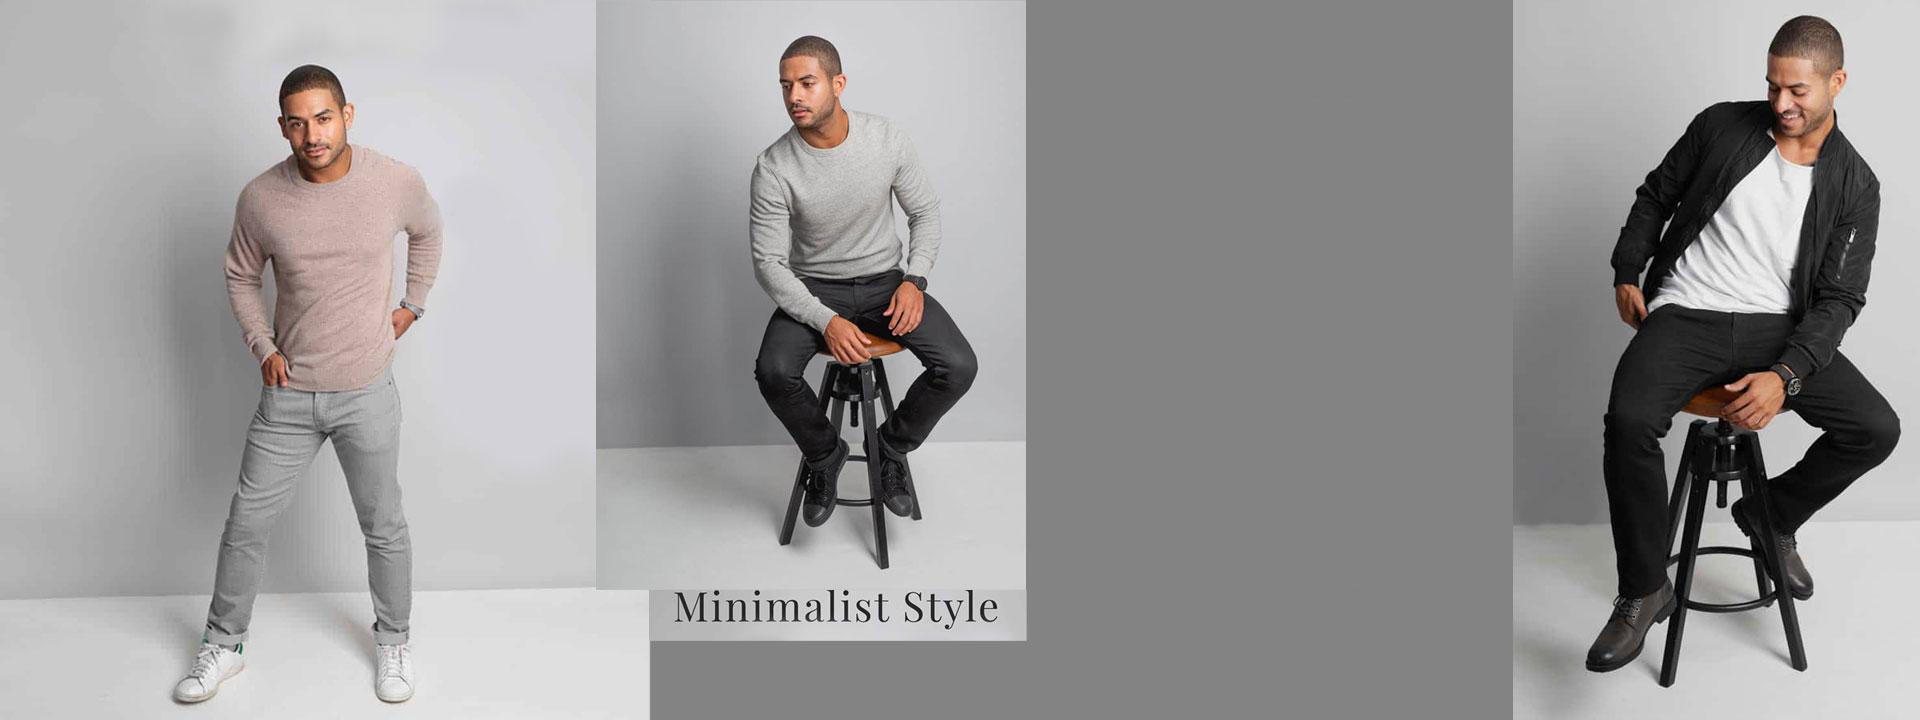 minimalist fashion 51 - استایل مینیمال مردانه